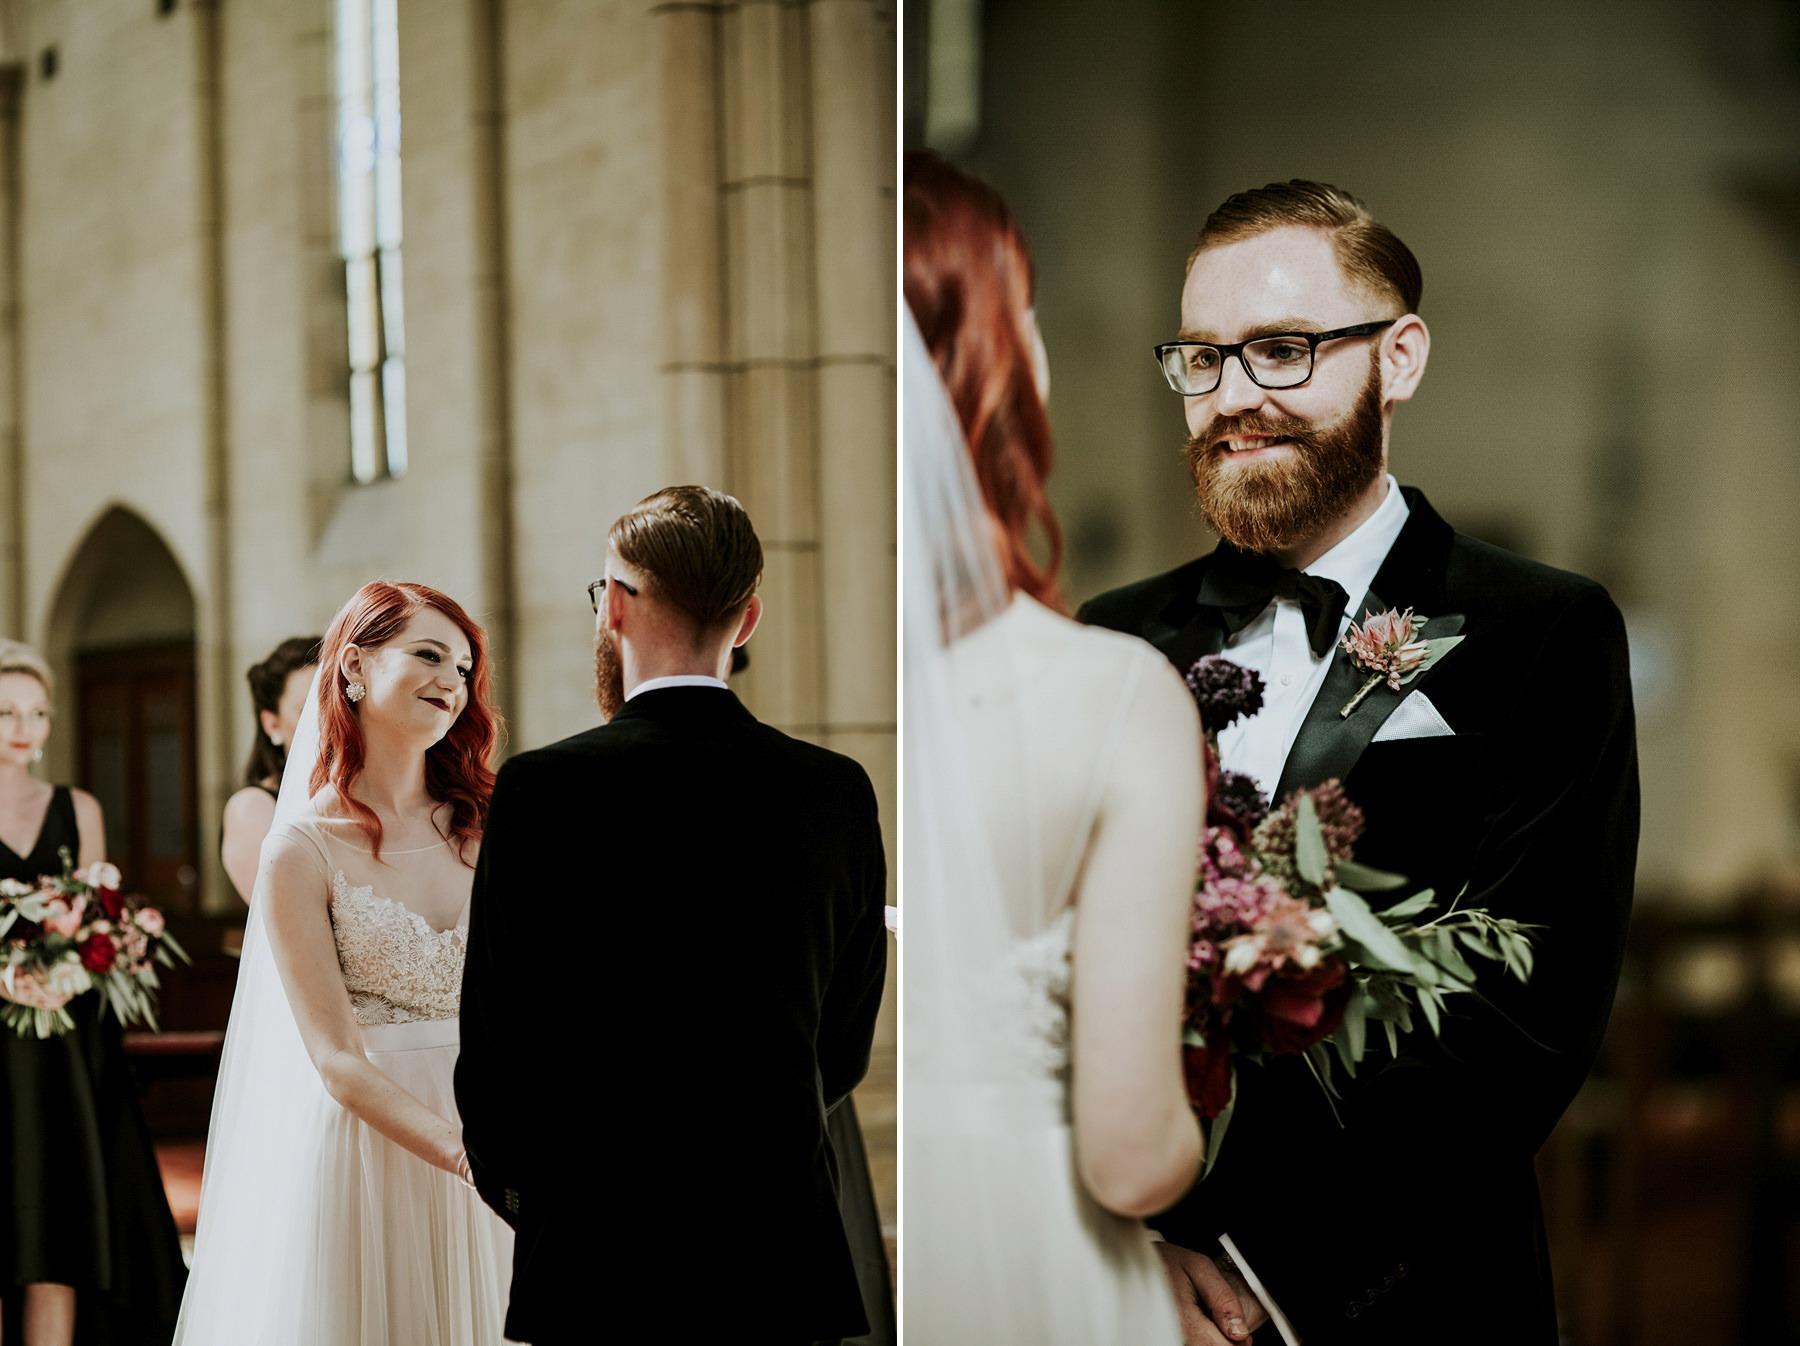 flour-factory-wedding_perth-city-wedding-224